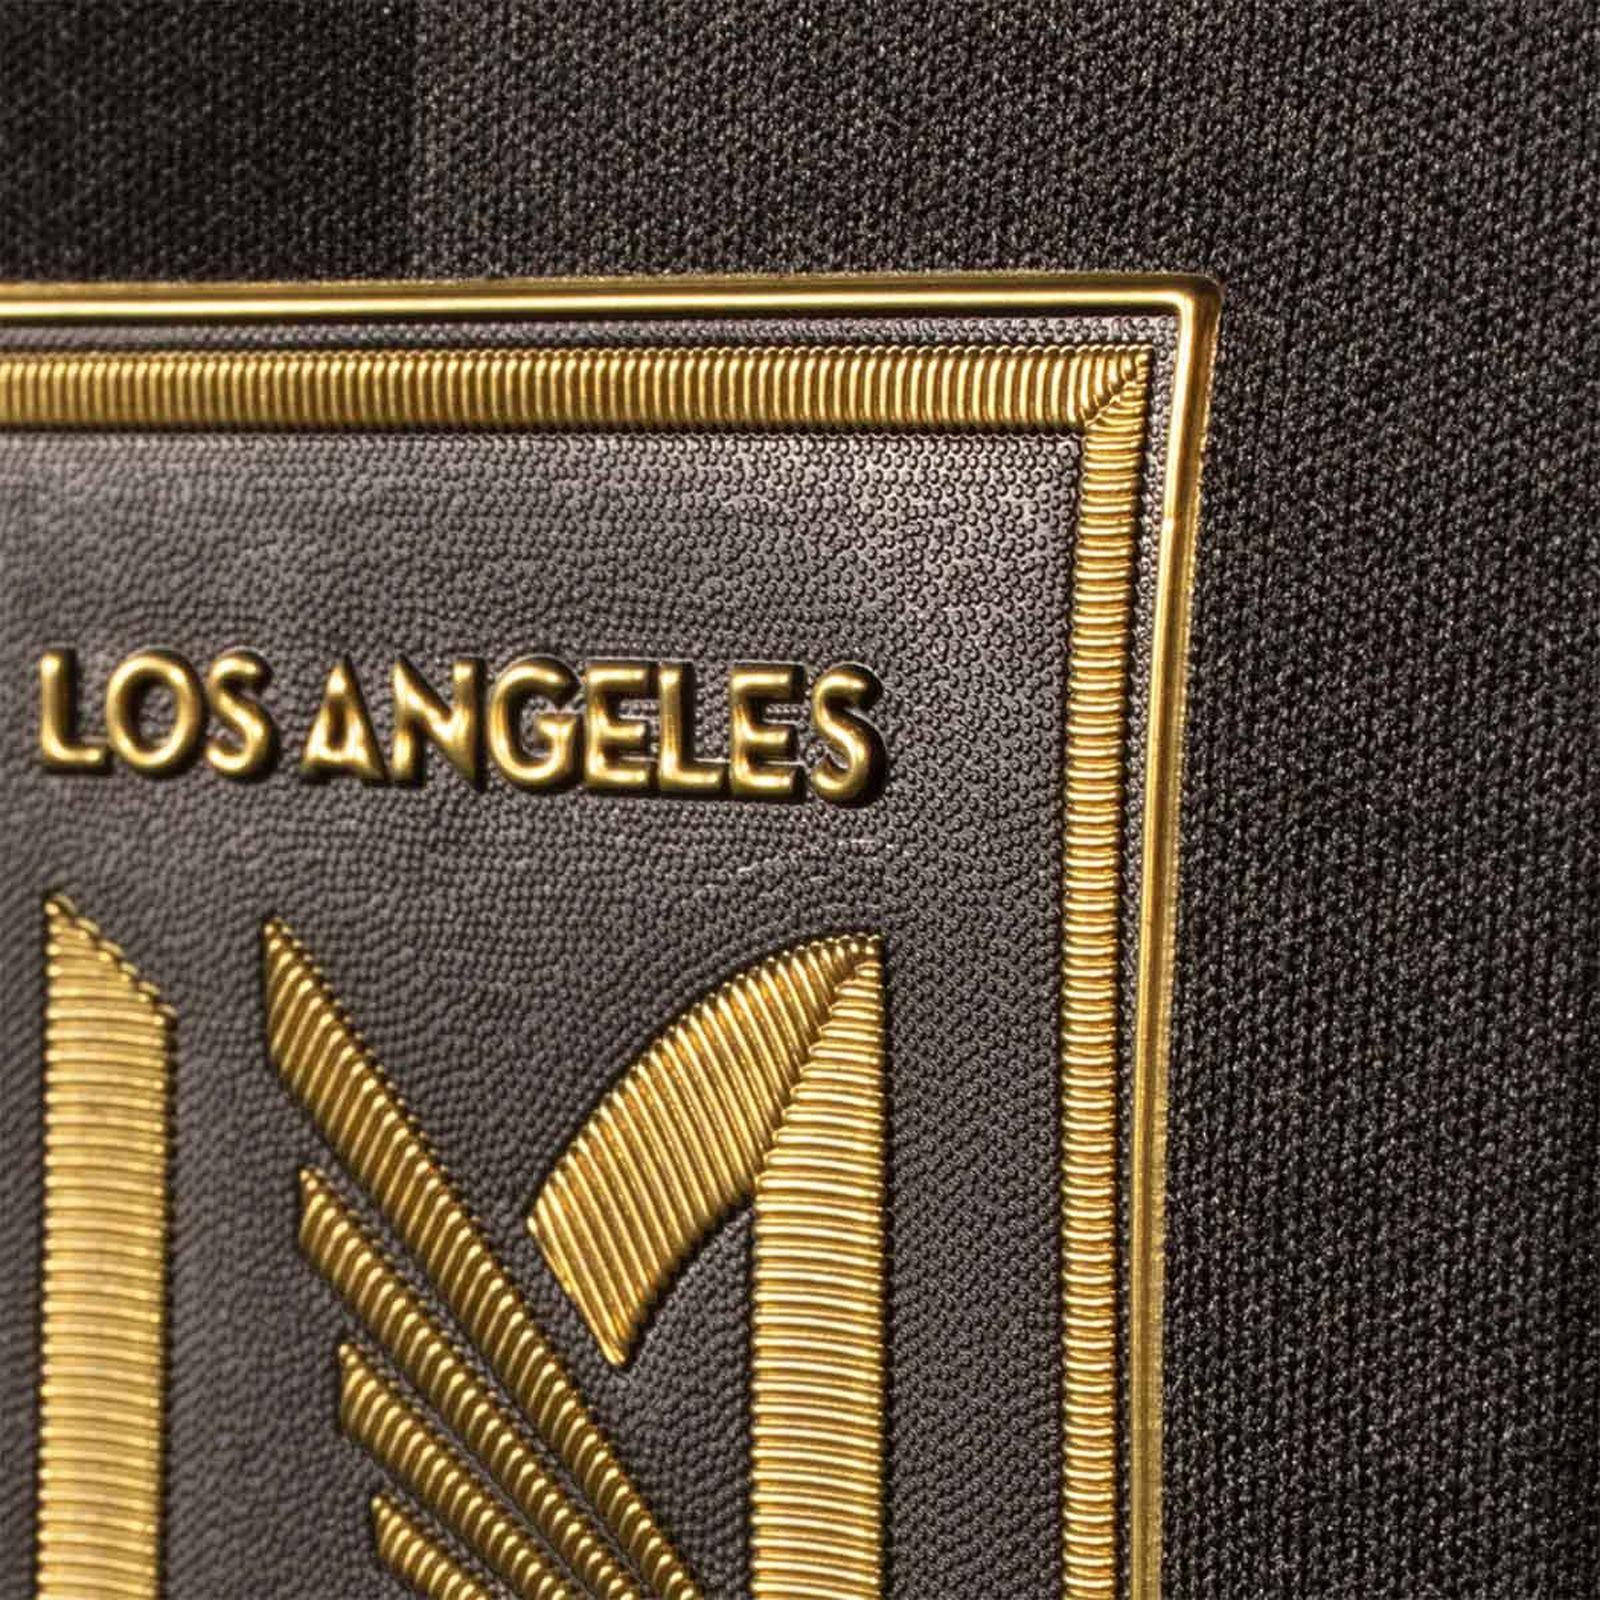 DescriptionLos Angeles Football Club